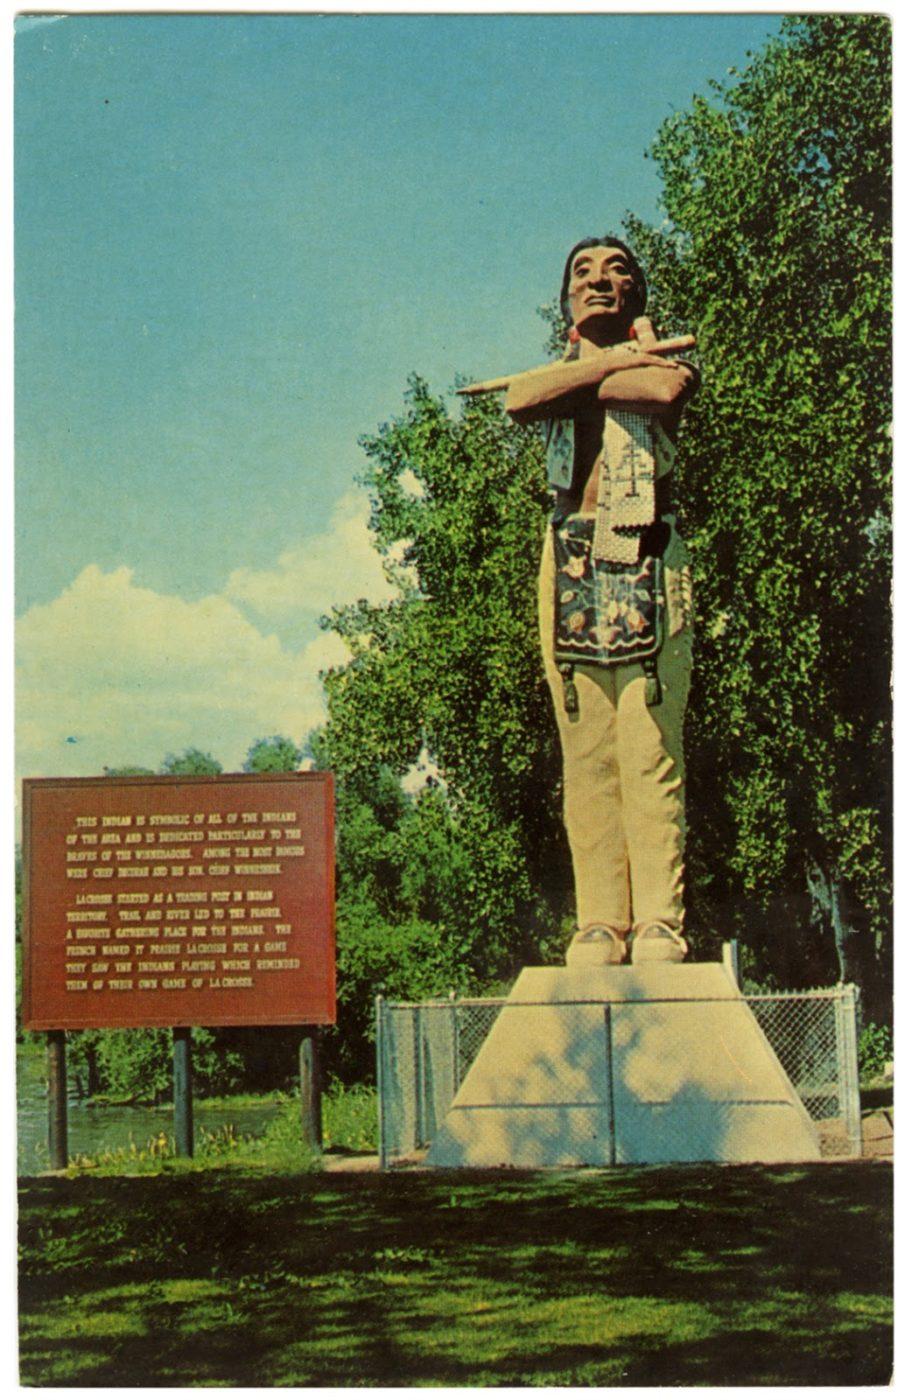 Hiawatha Statute Debated